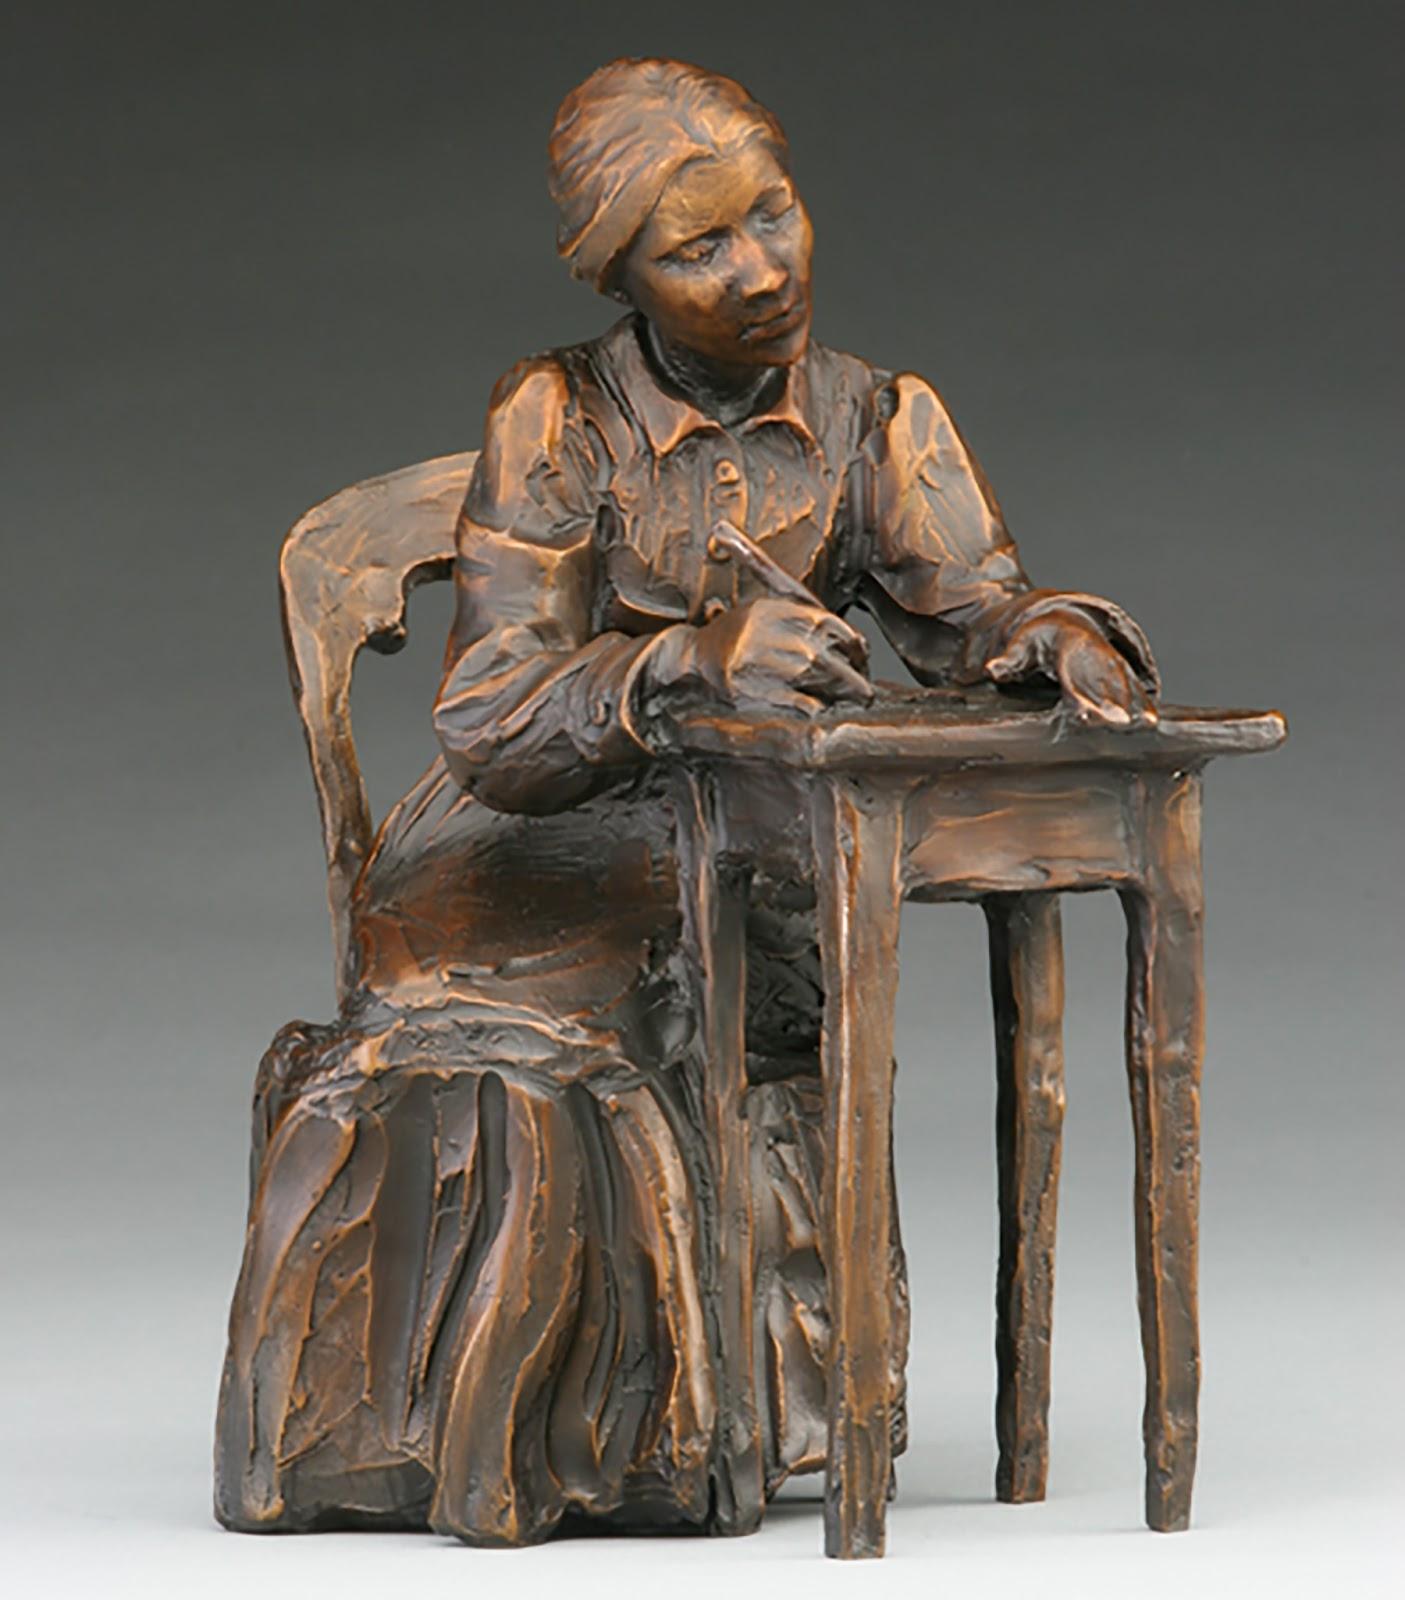 Jane DeDecker Emily Dickinson